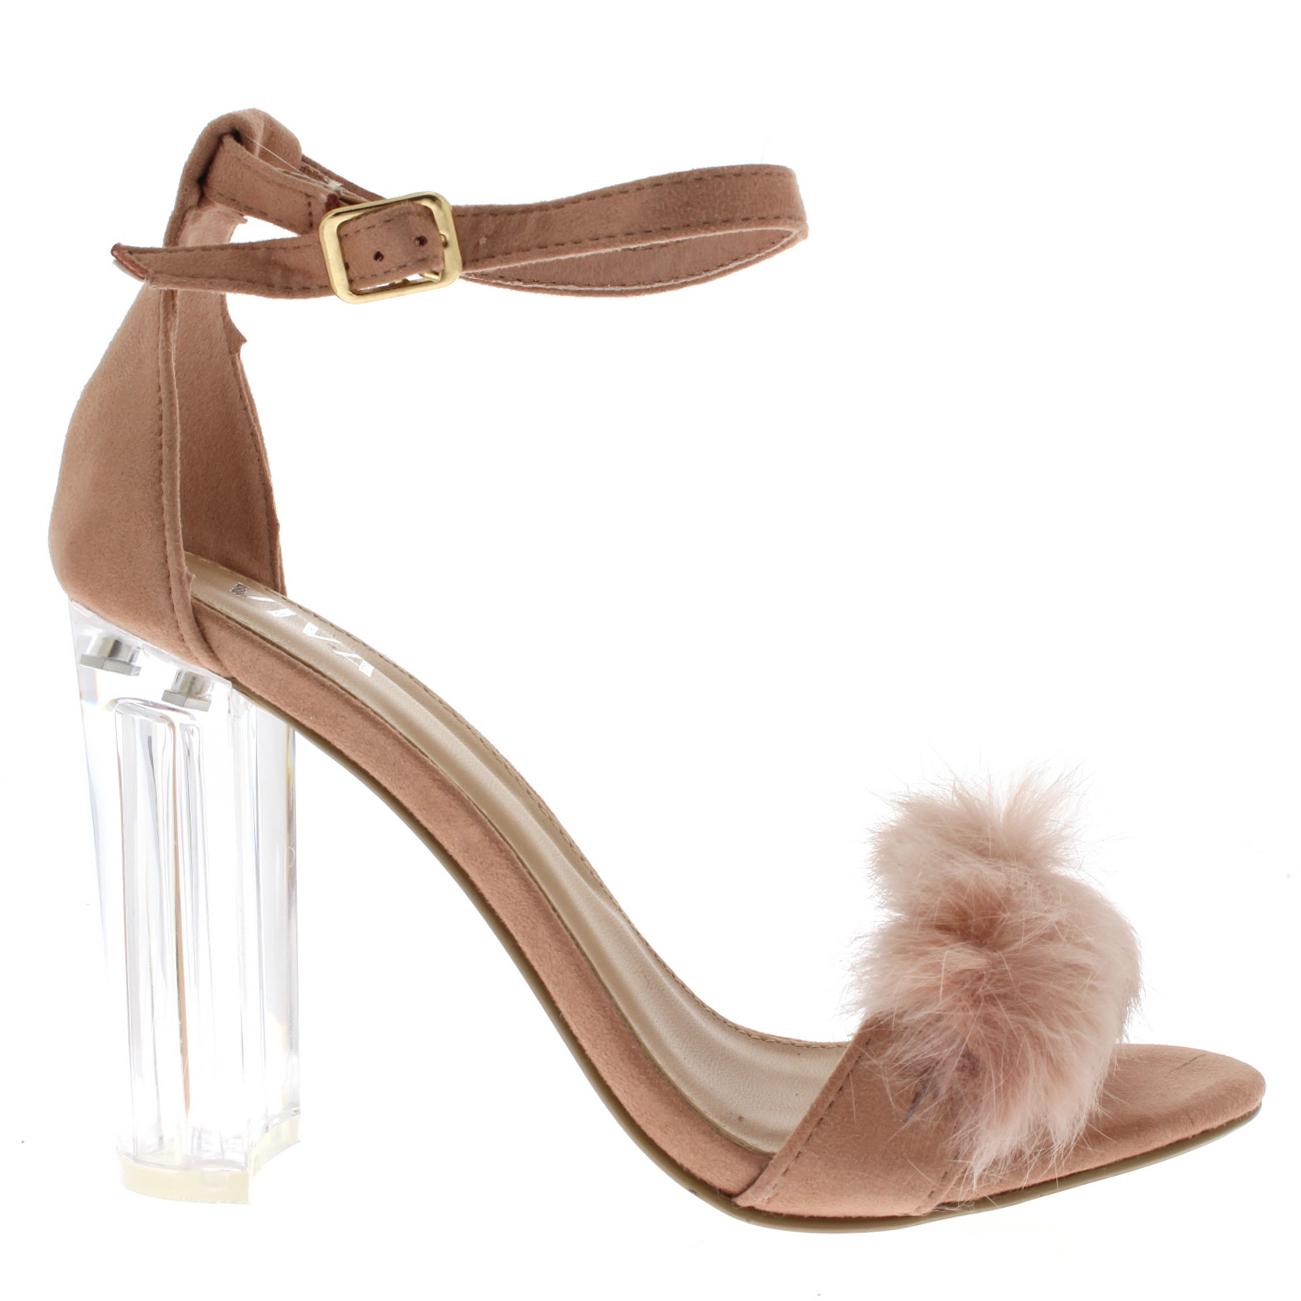 3bb1ecea438 Womens Fluffy Glass Block Heel Party Cut Out Fashion High Heels ...